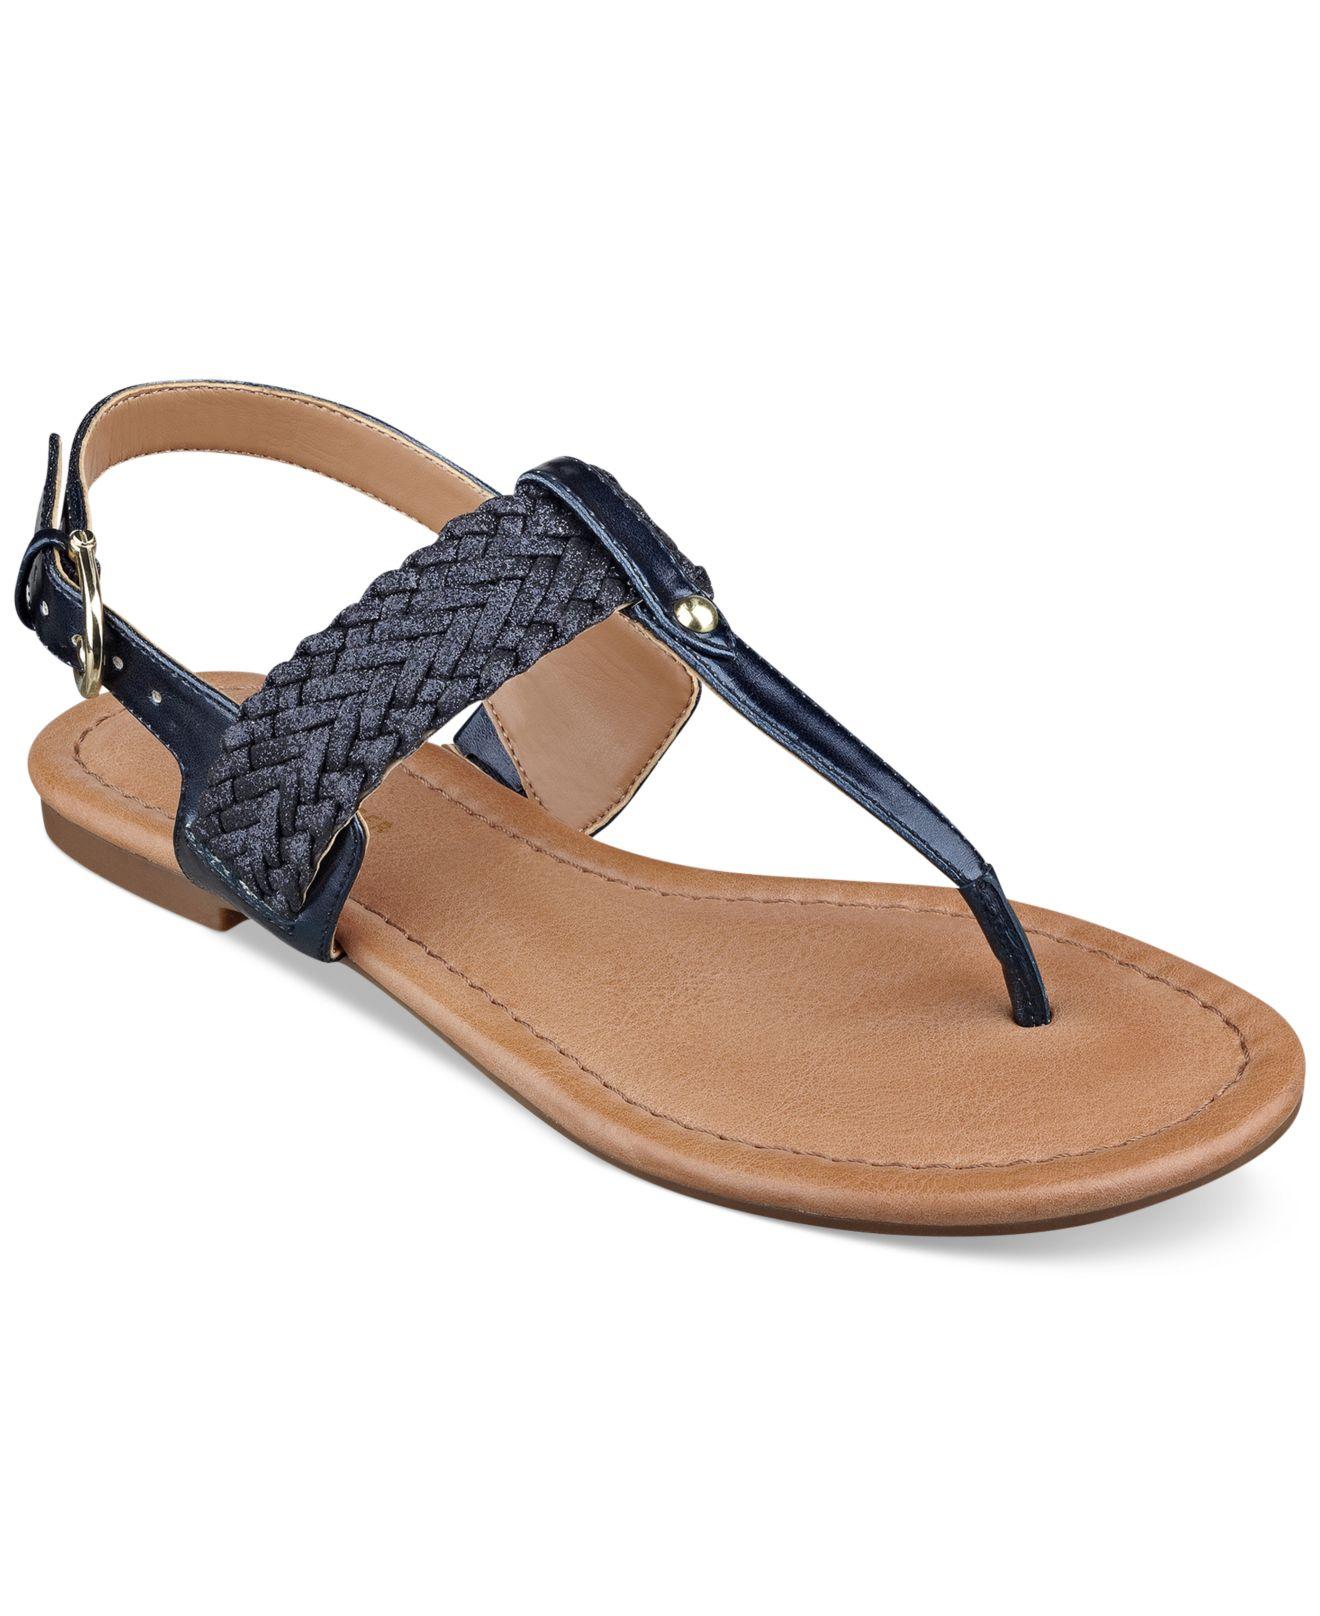 0efc23db828a Lyst - Tommy Hilfiger Women S Saycn Flat Thong Sandals in Blue